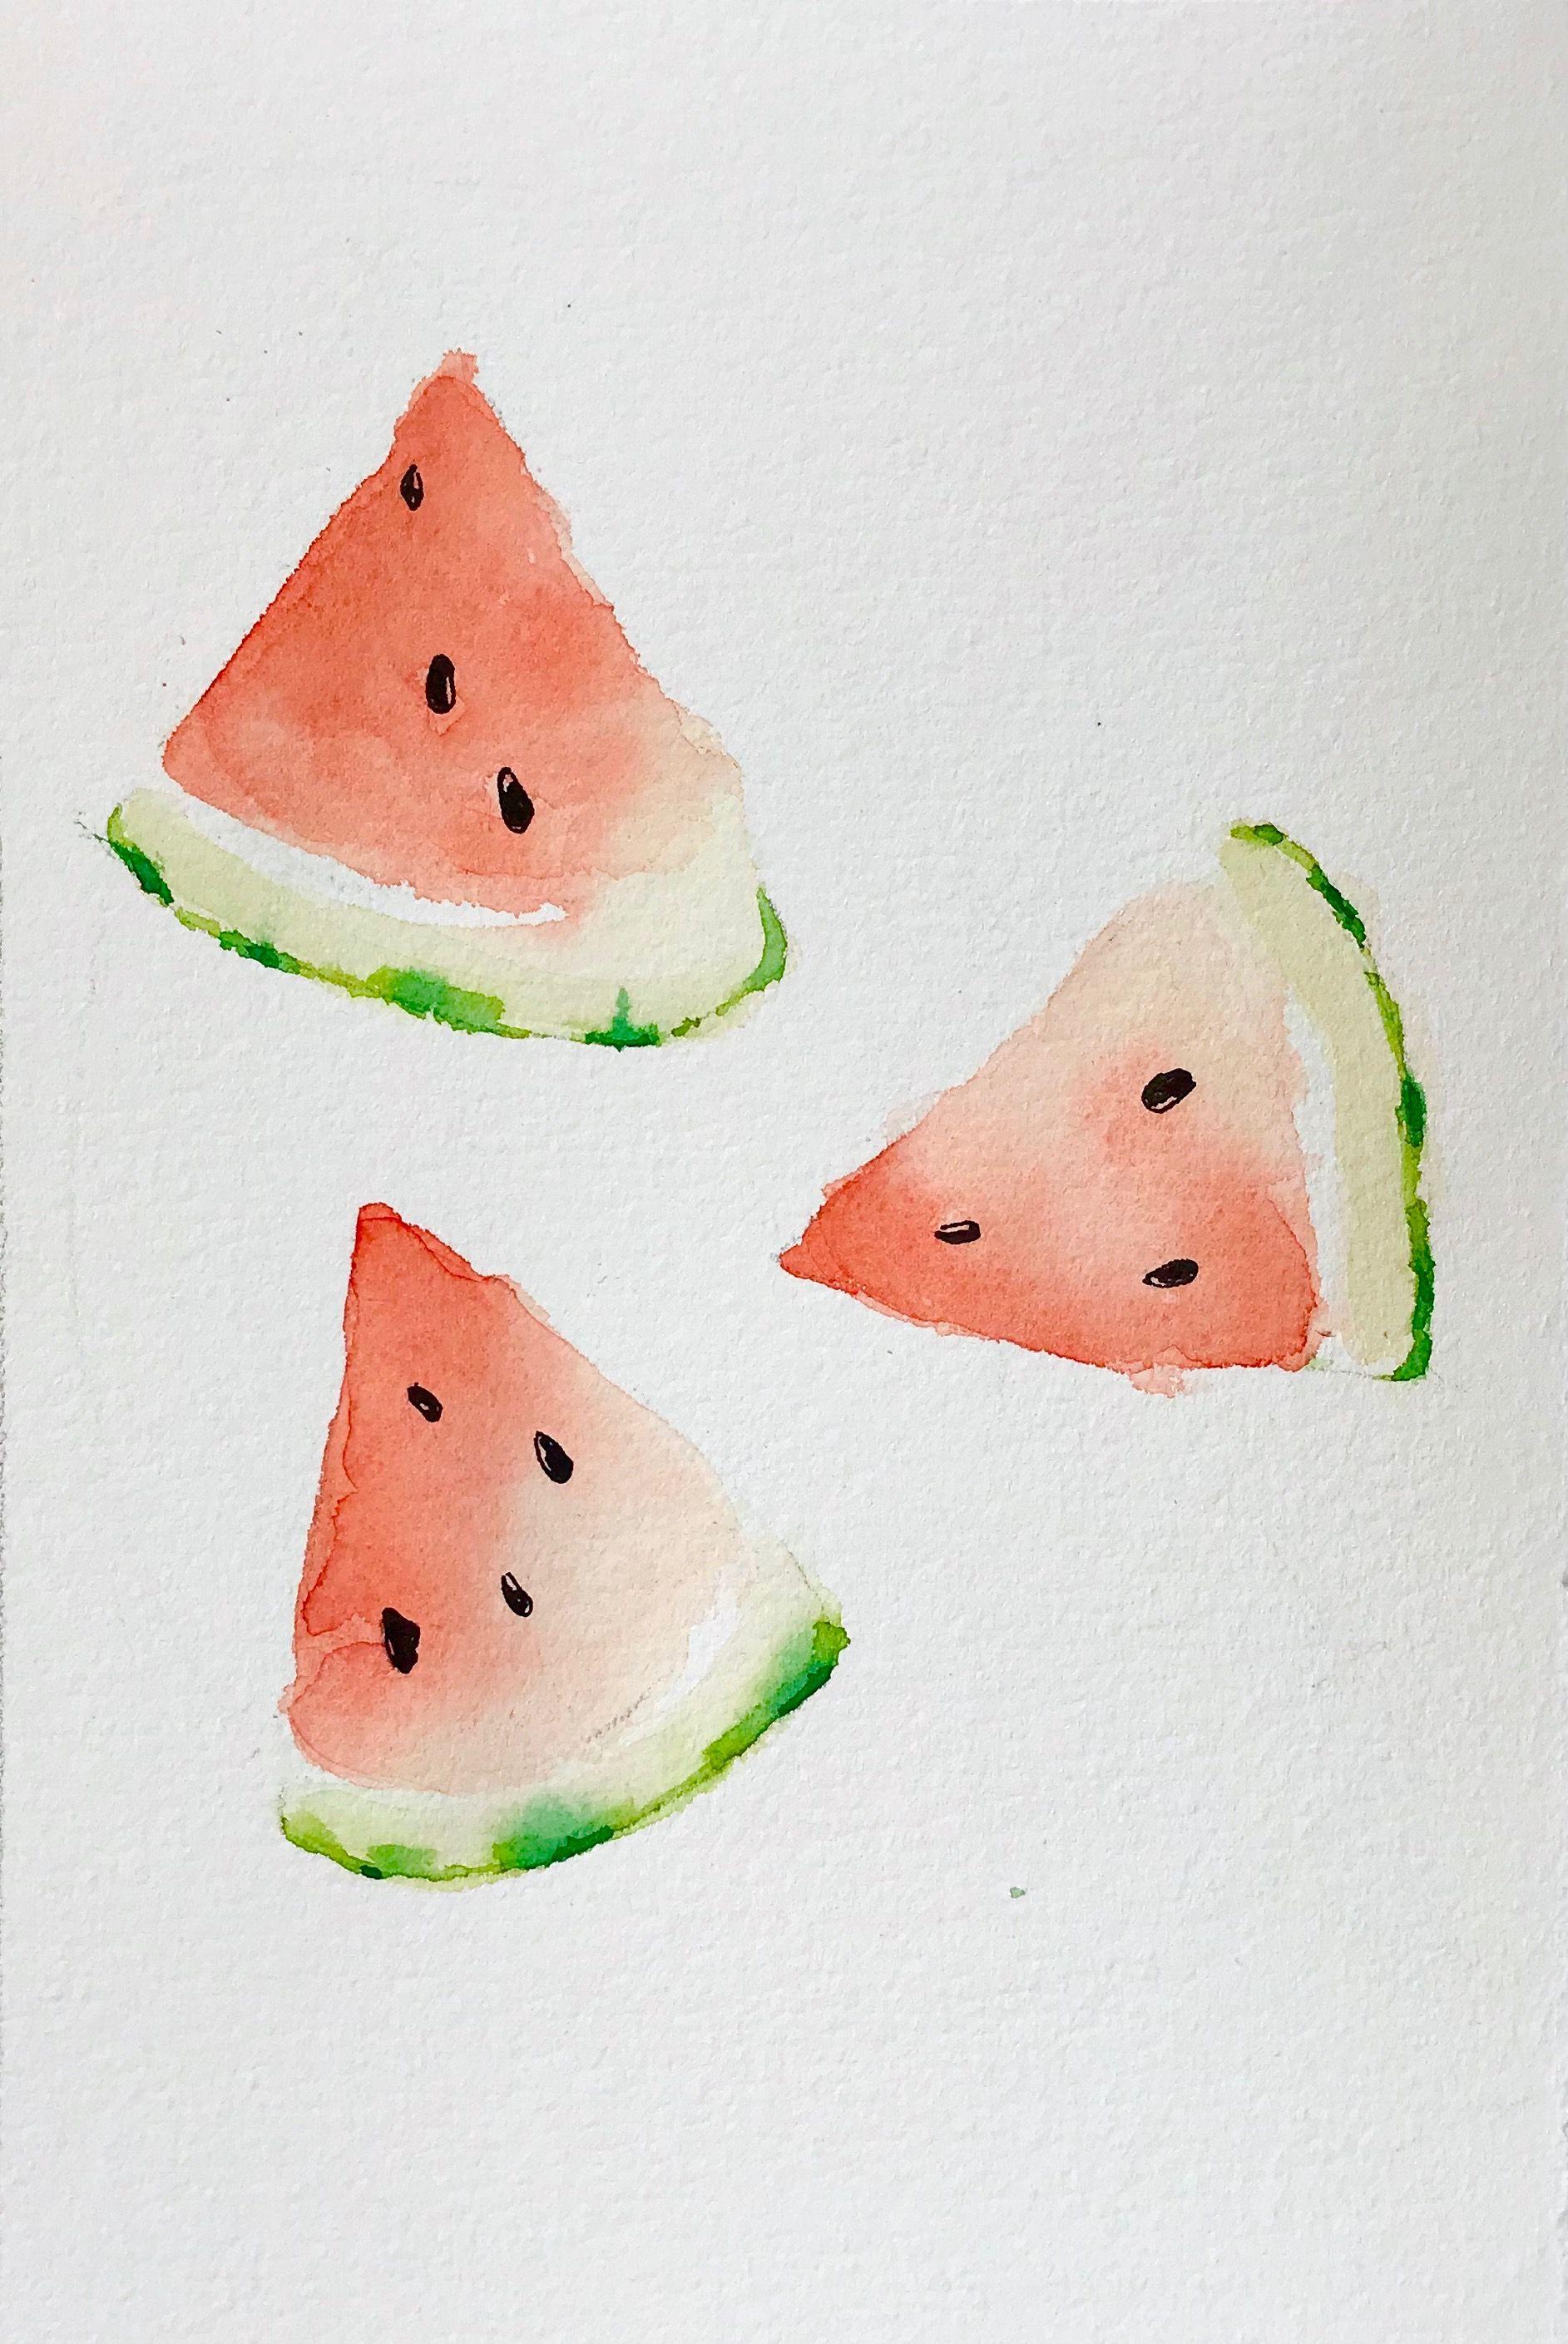 Watermelon Watercolor Painting Tutorial And Home Decor Ideas Suluboya Teknikleri Sulu Boya Suluboya